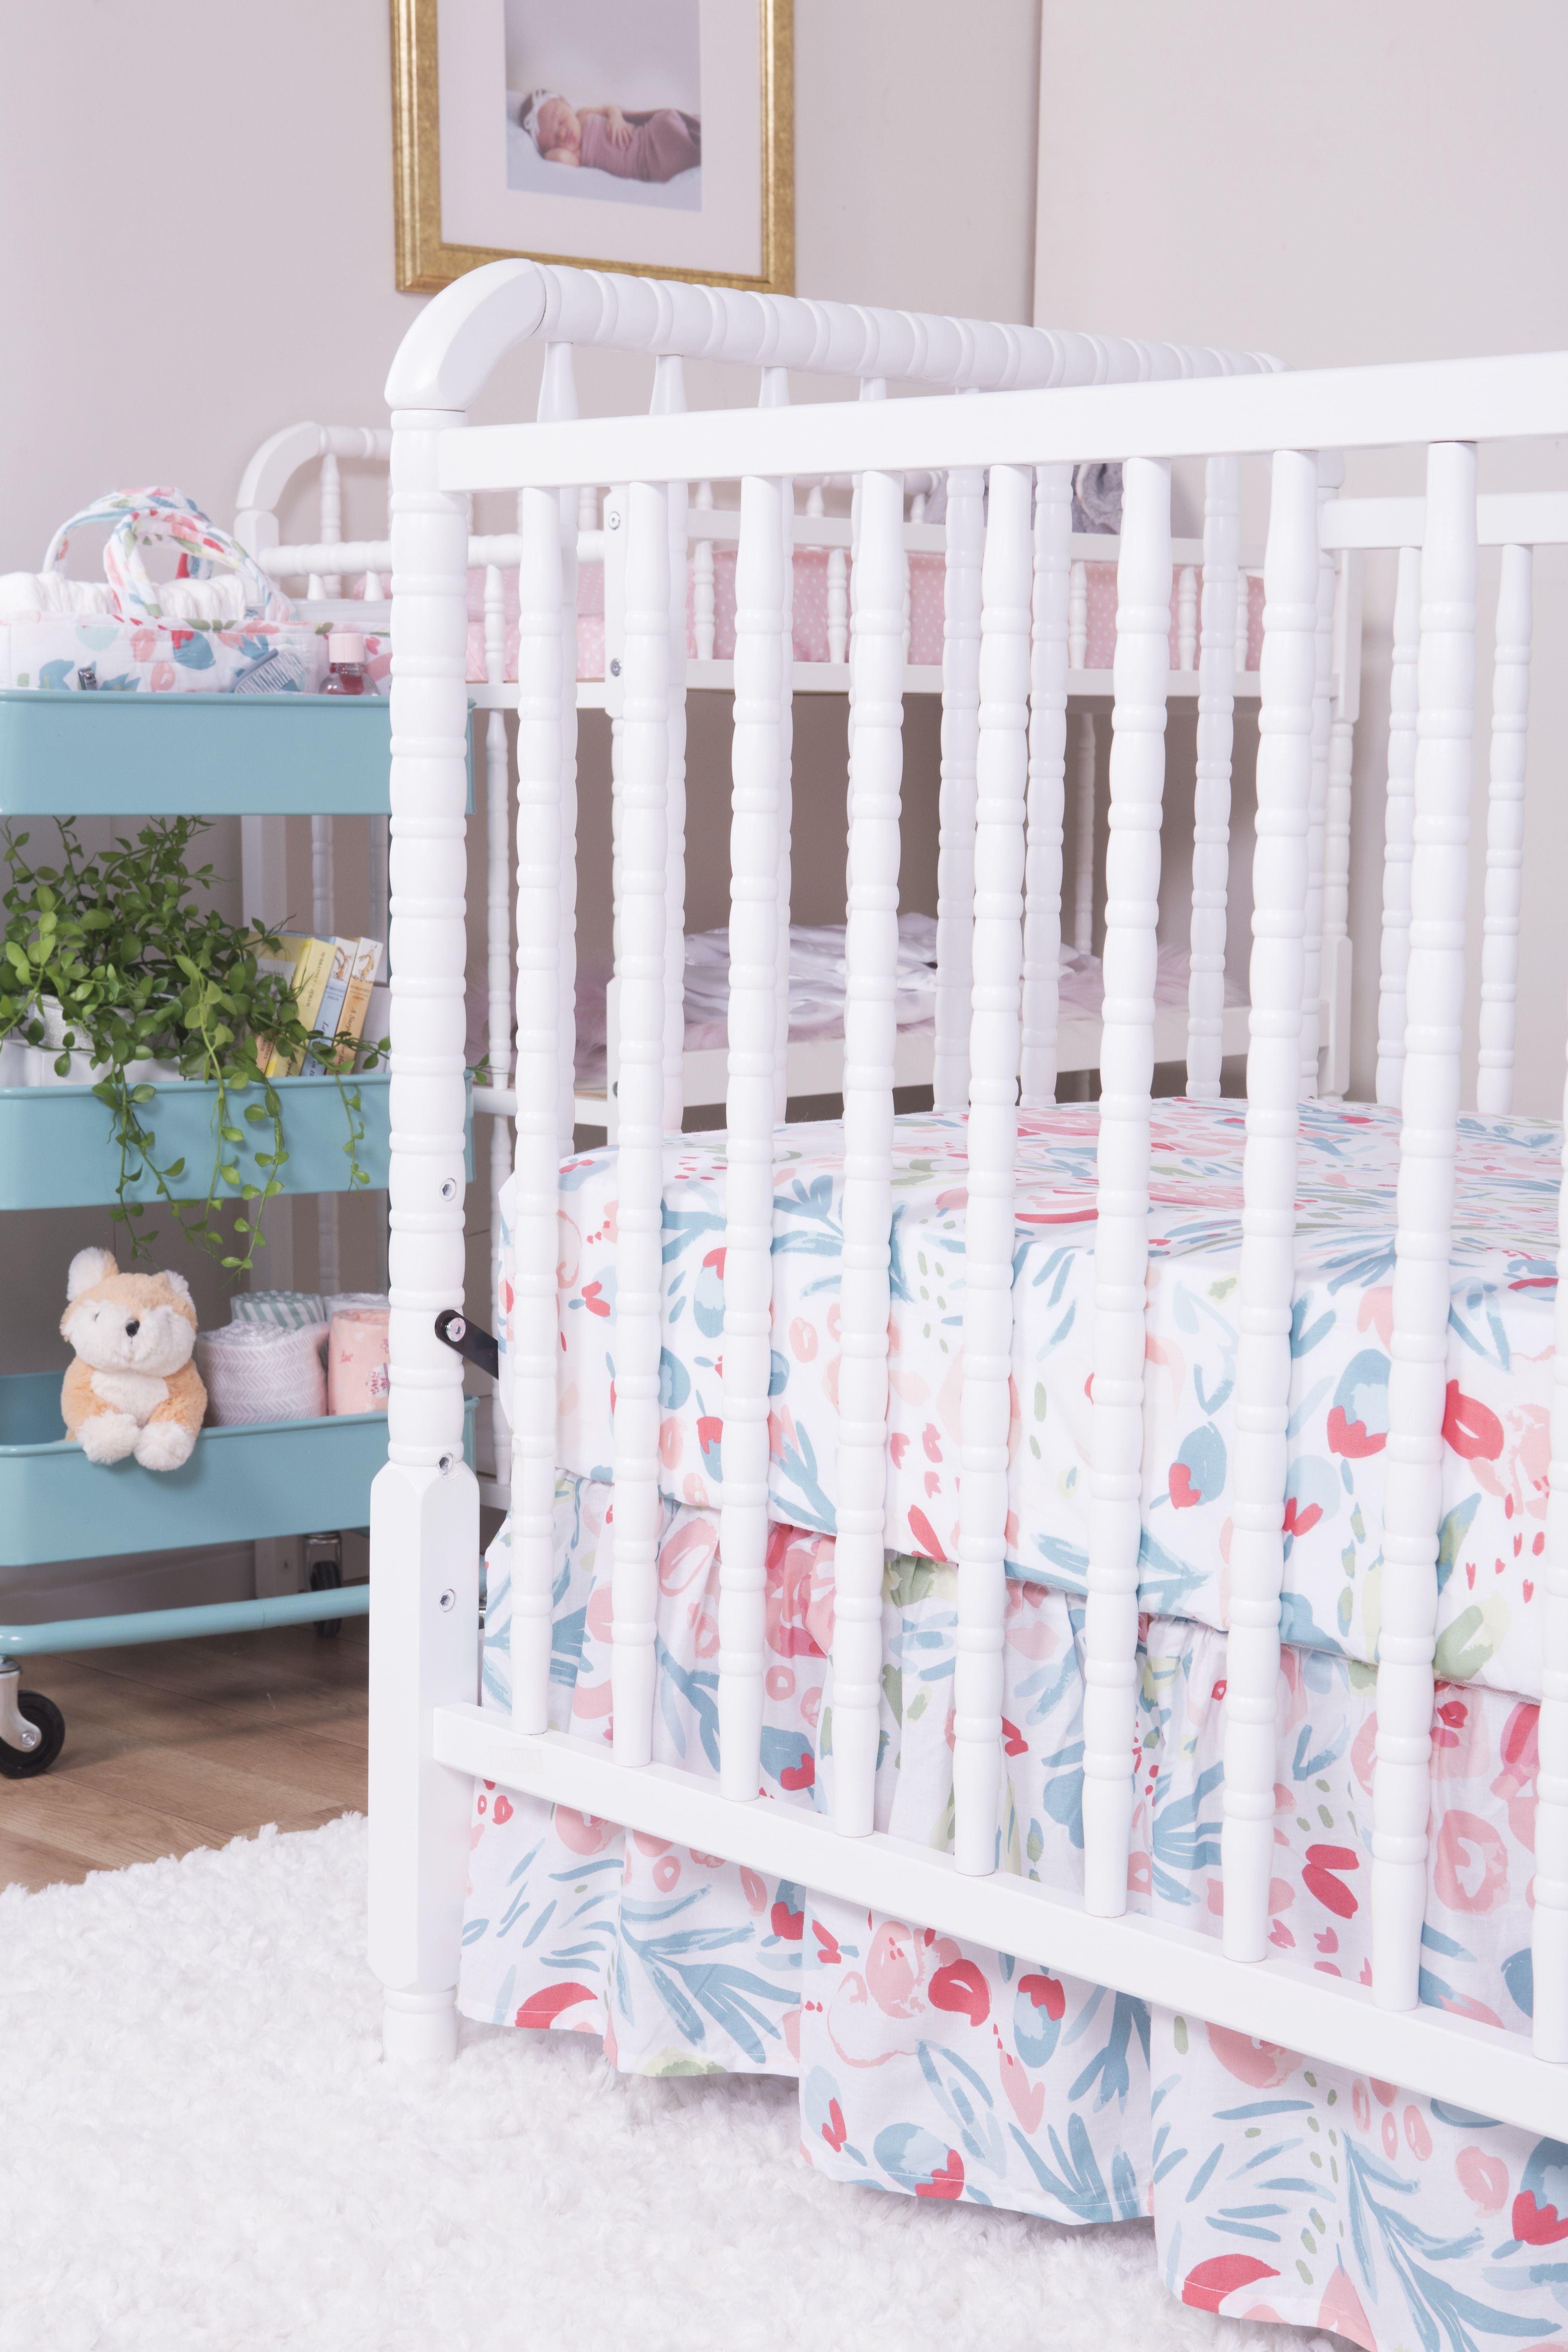 Painterly Floral 3 Piece Crib Bedding Set Mini Crib Bedding Crib Bedding Sets Rose Bedding 3 piece crib bedding set